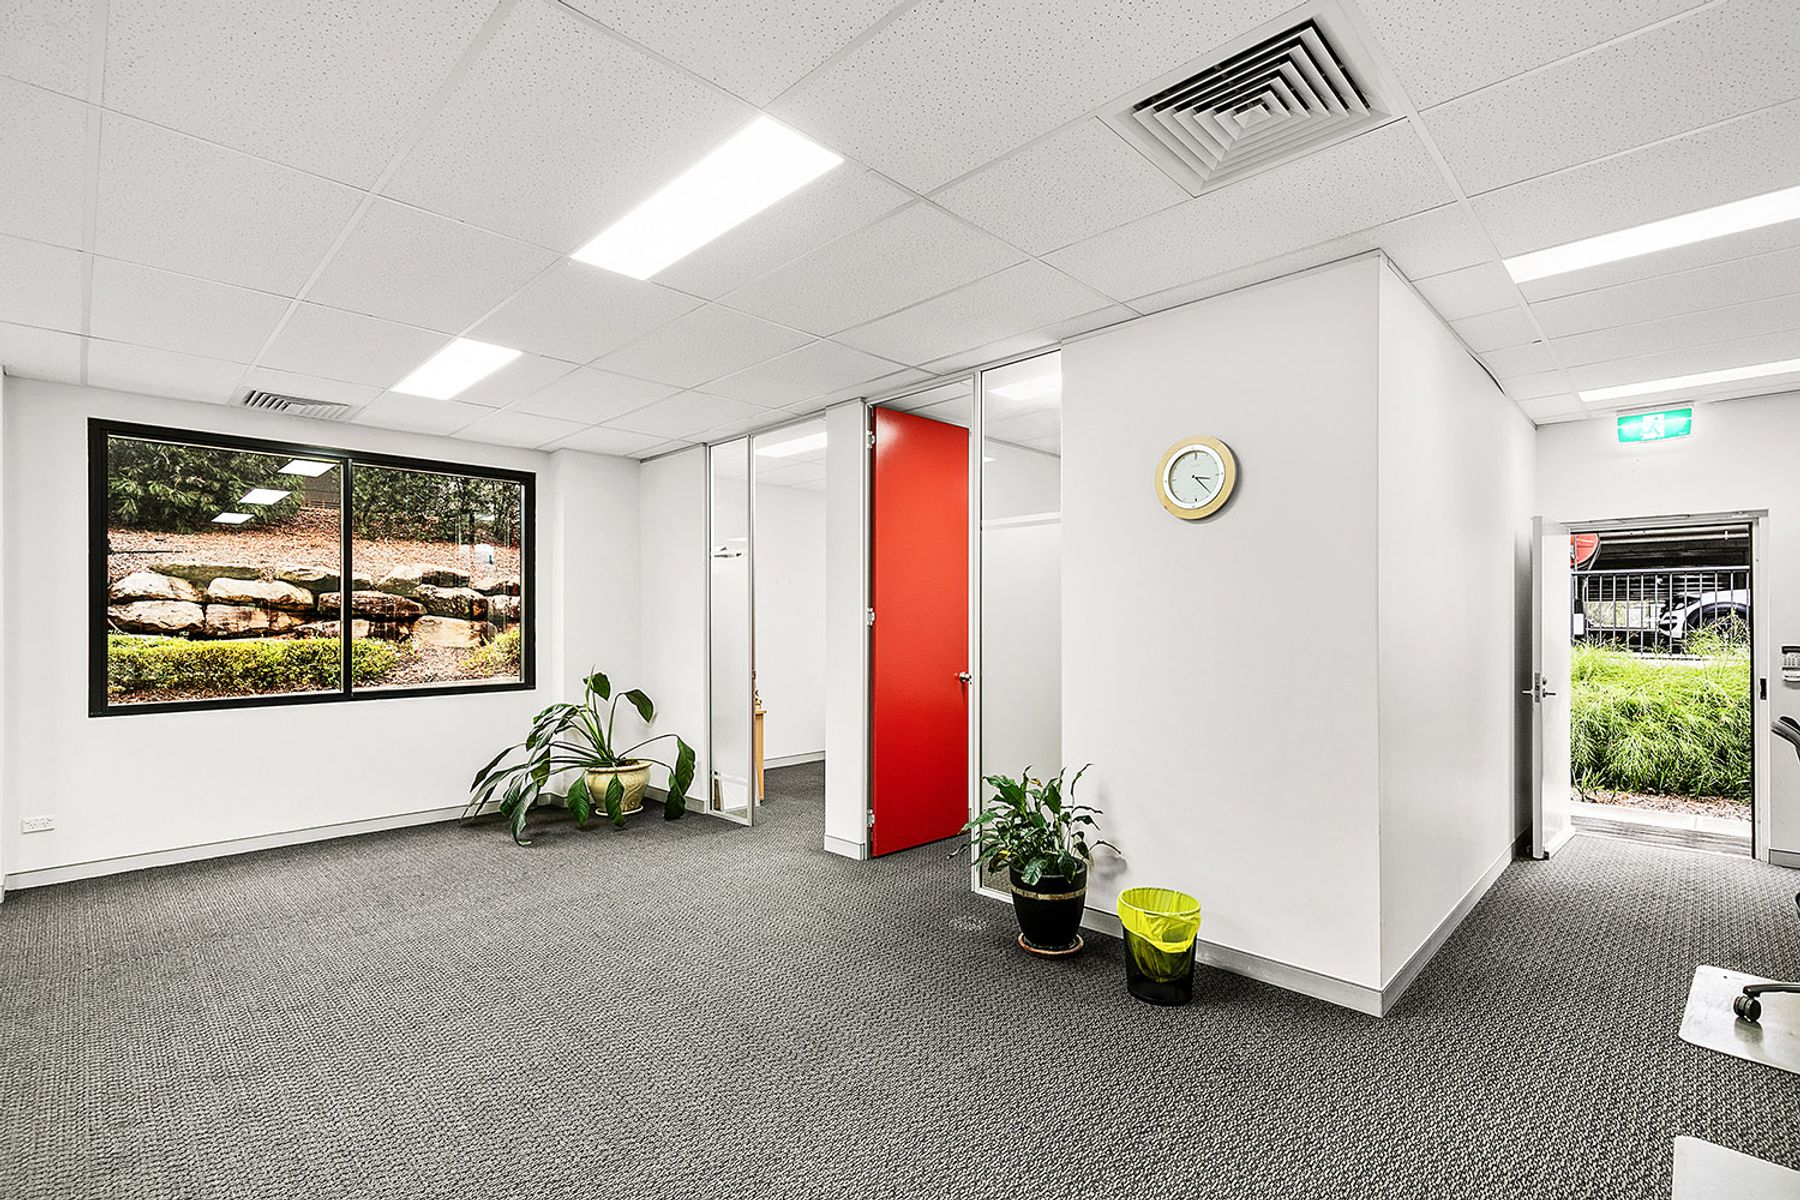 B4/12-14 Solent Circuit, Baulkham Hills, NSW 2153